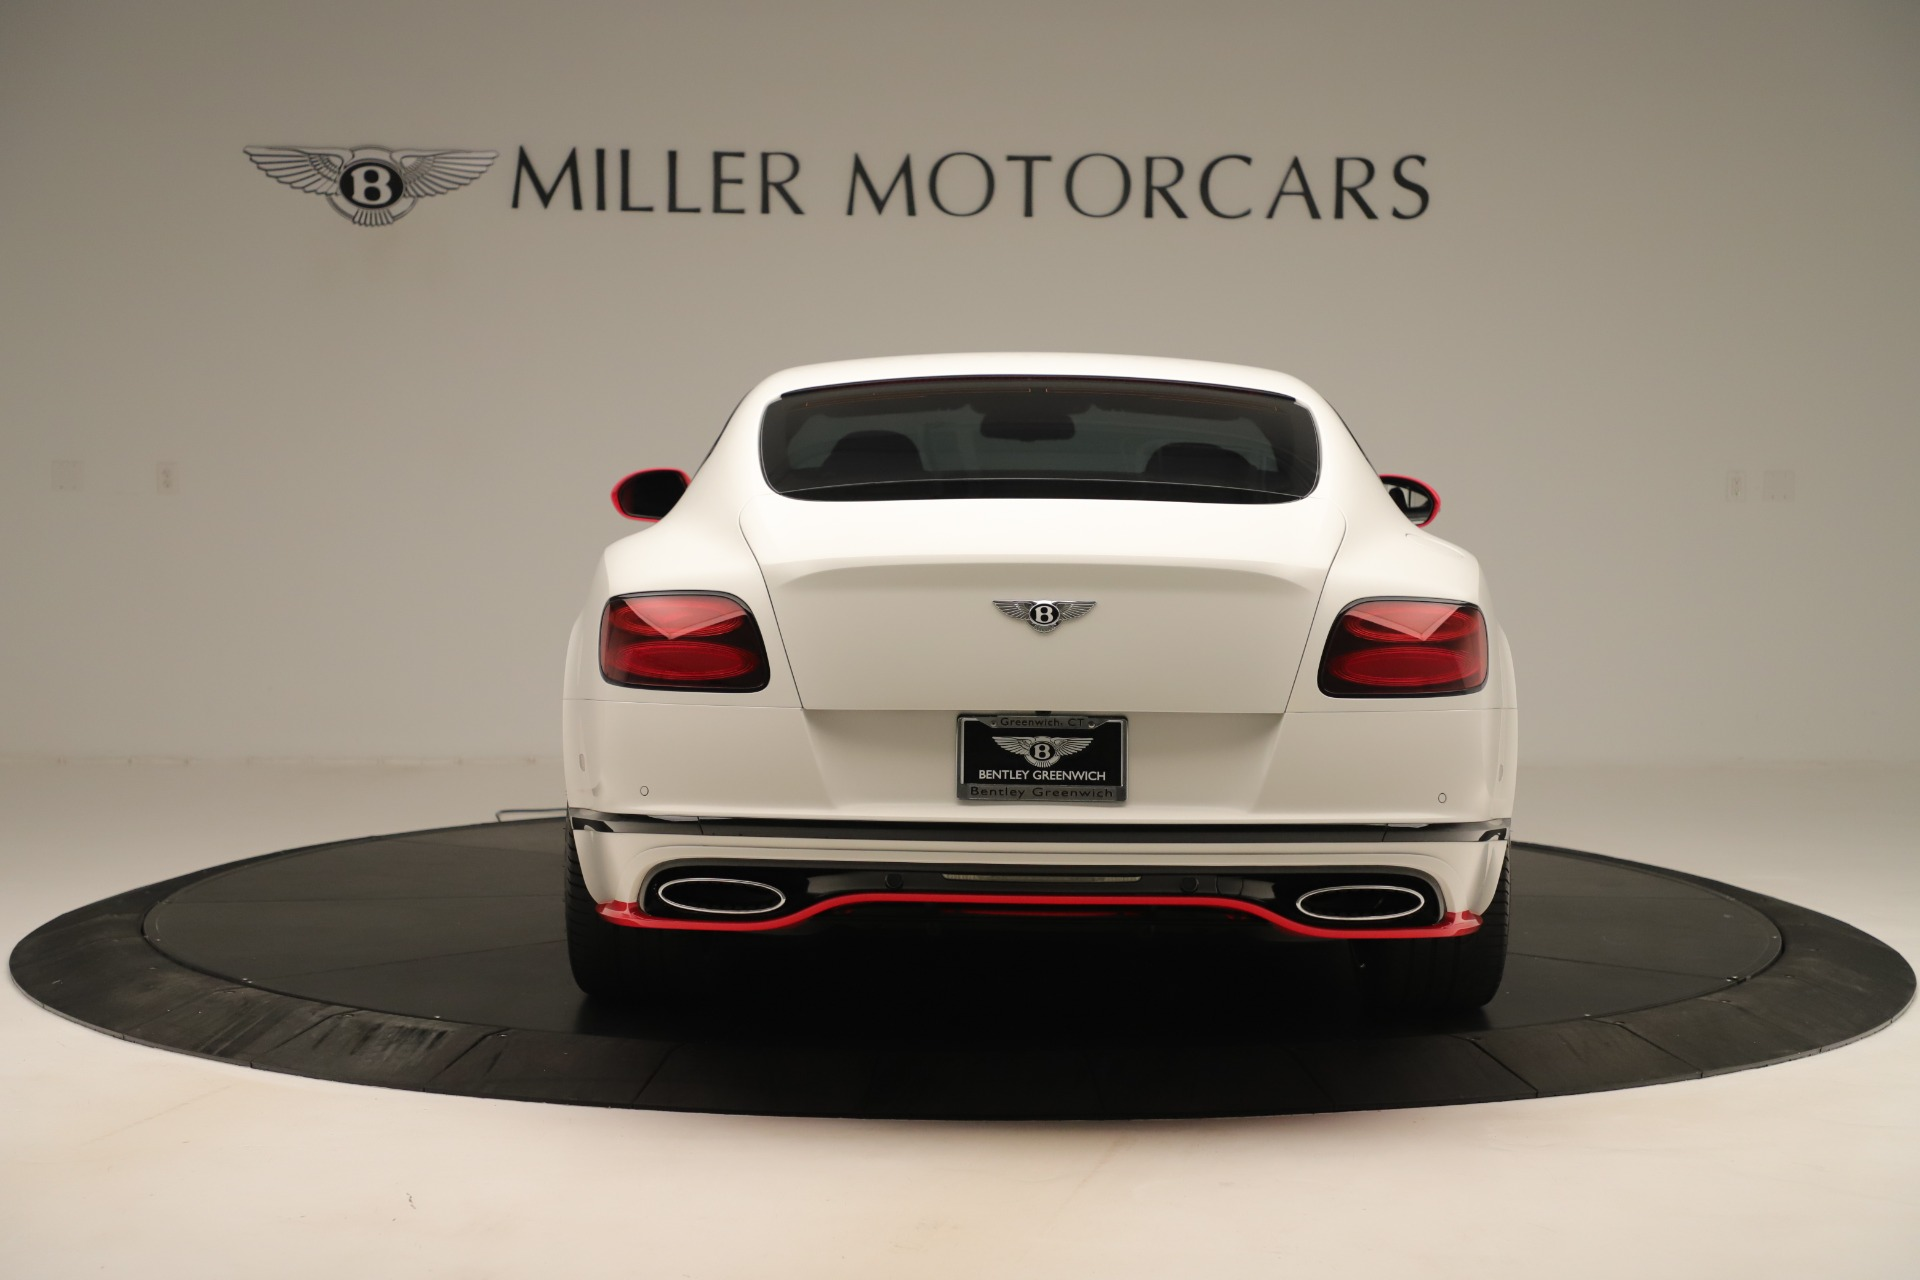 Used 2017 Bentley Continental GT Speed For Sale In Westport, CT 706_p6